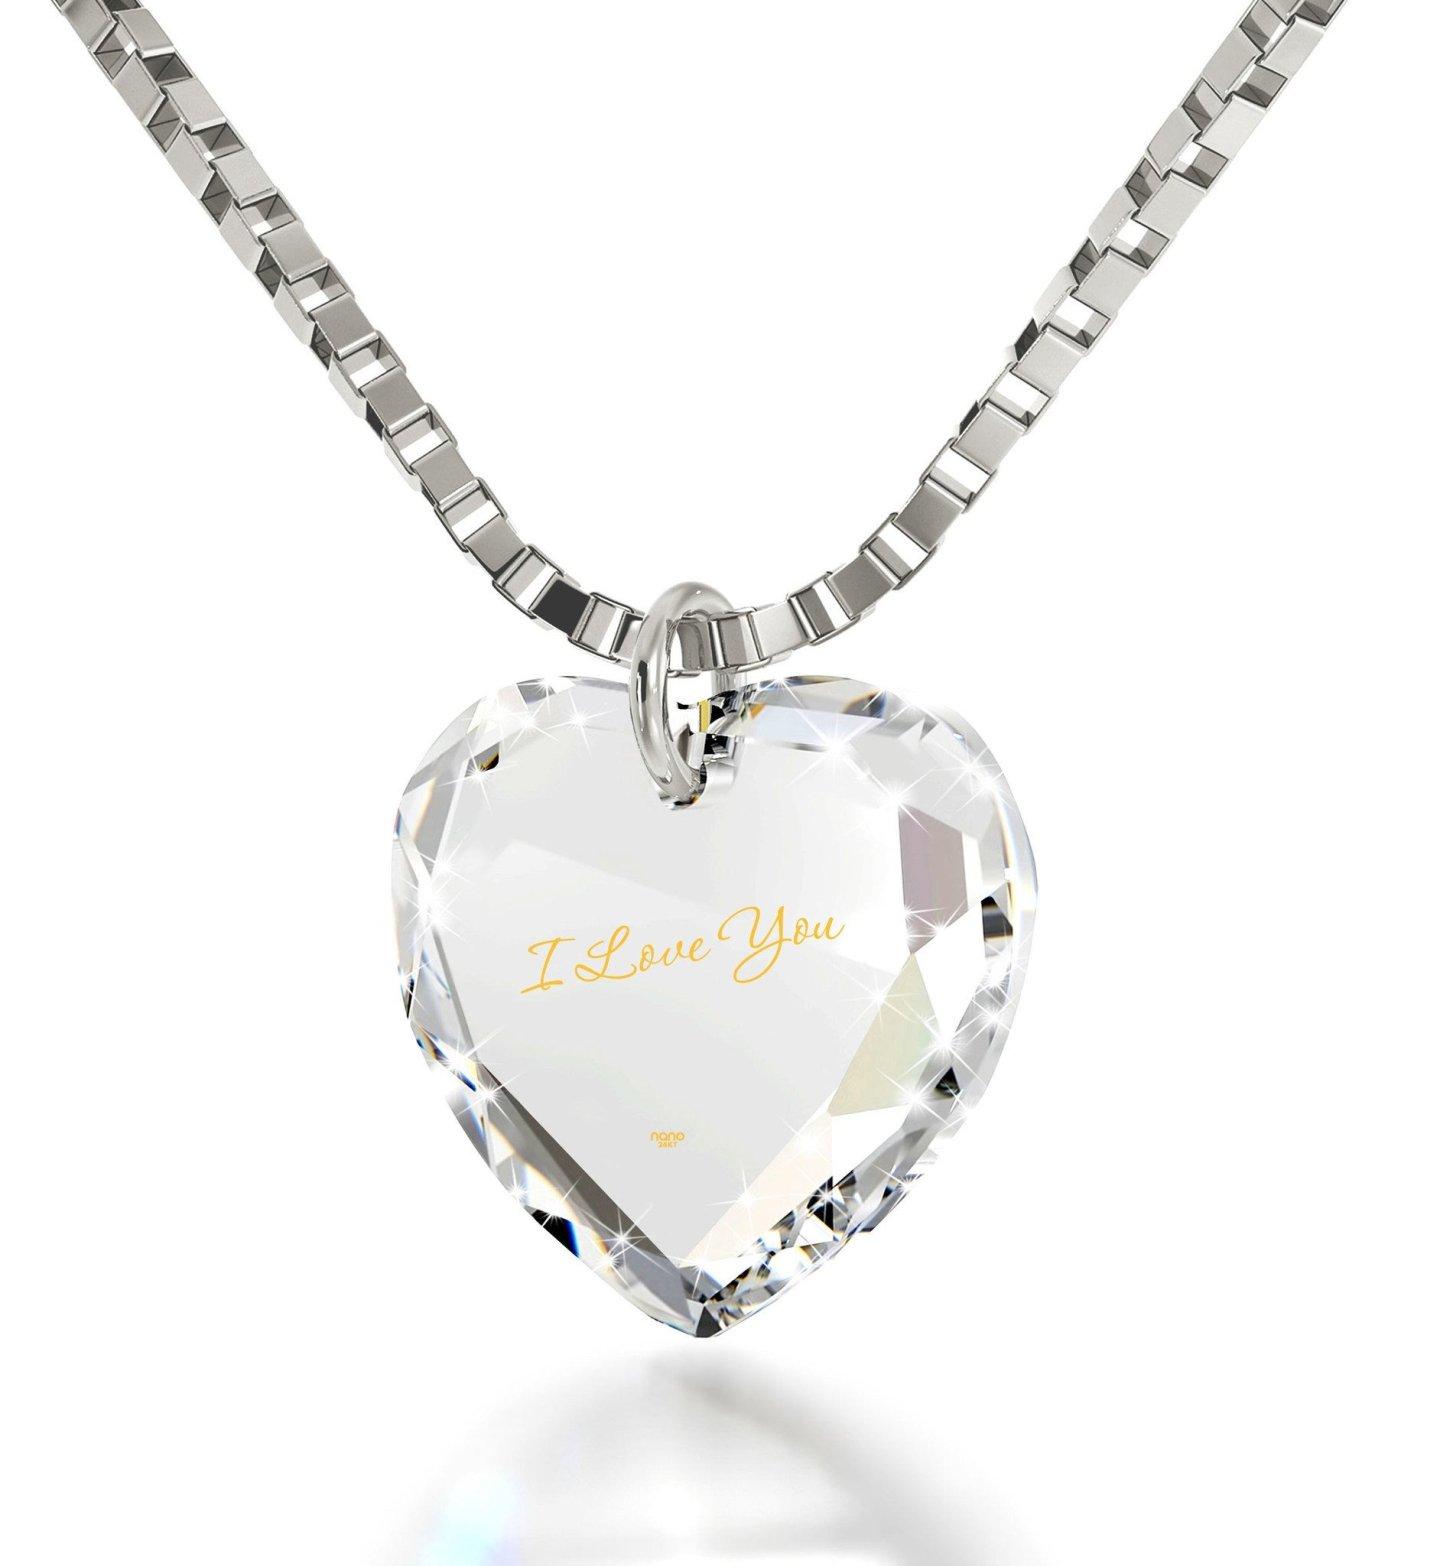 Christian Valentine gifts